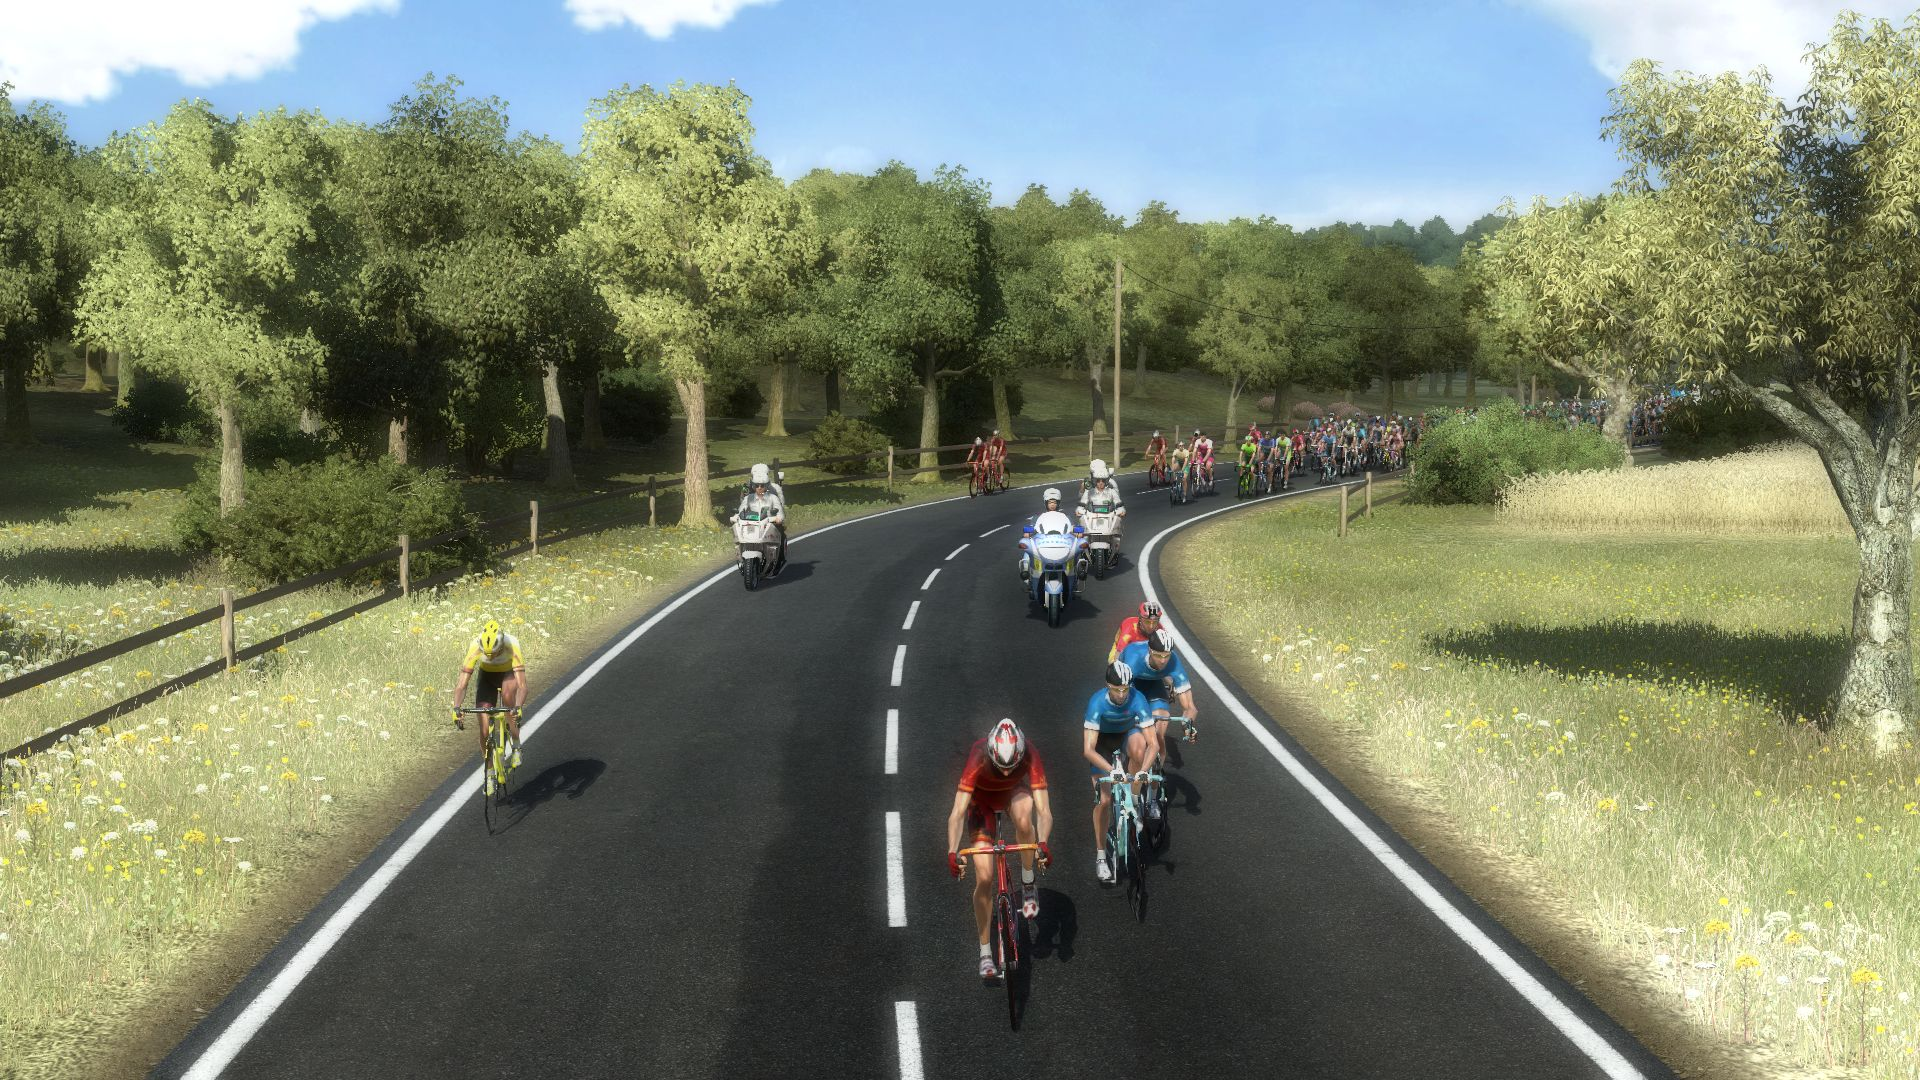 pcmdaily.com/images/mg/2019/Races/PT/Tirreno/mg19_ta_s07_10.jpg